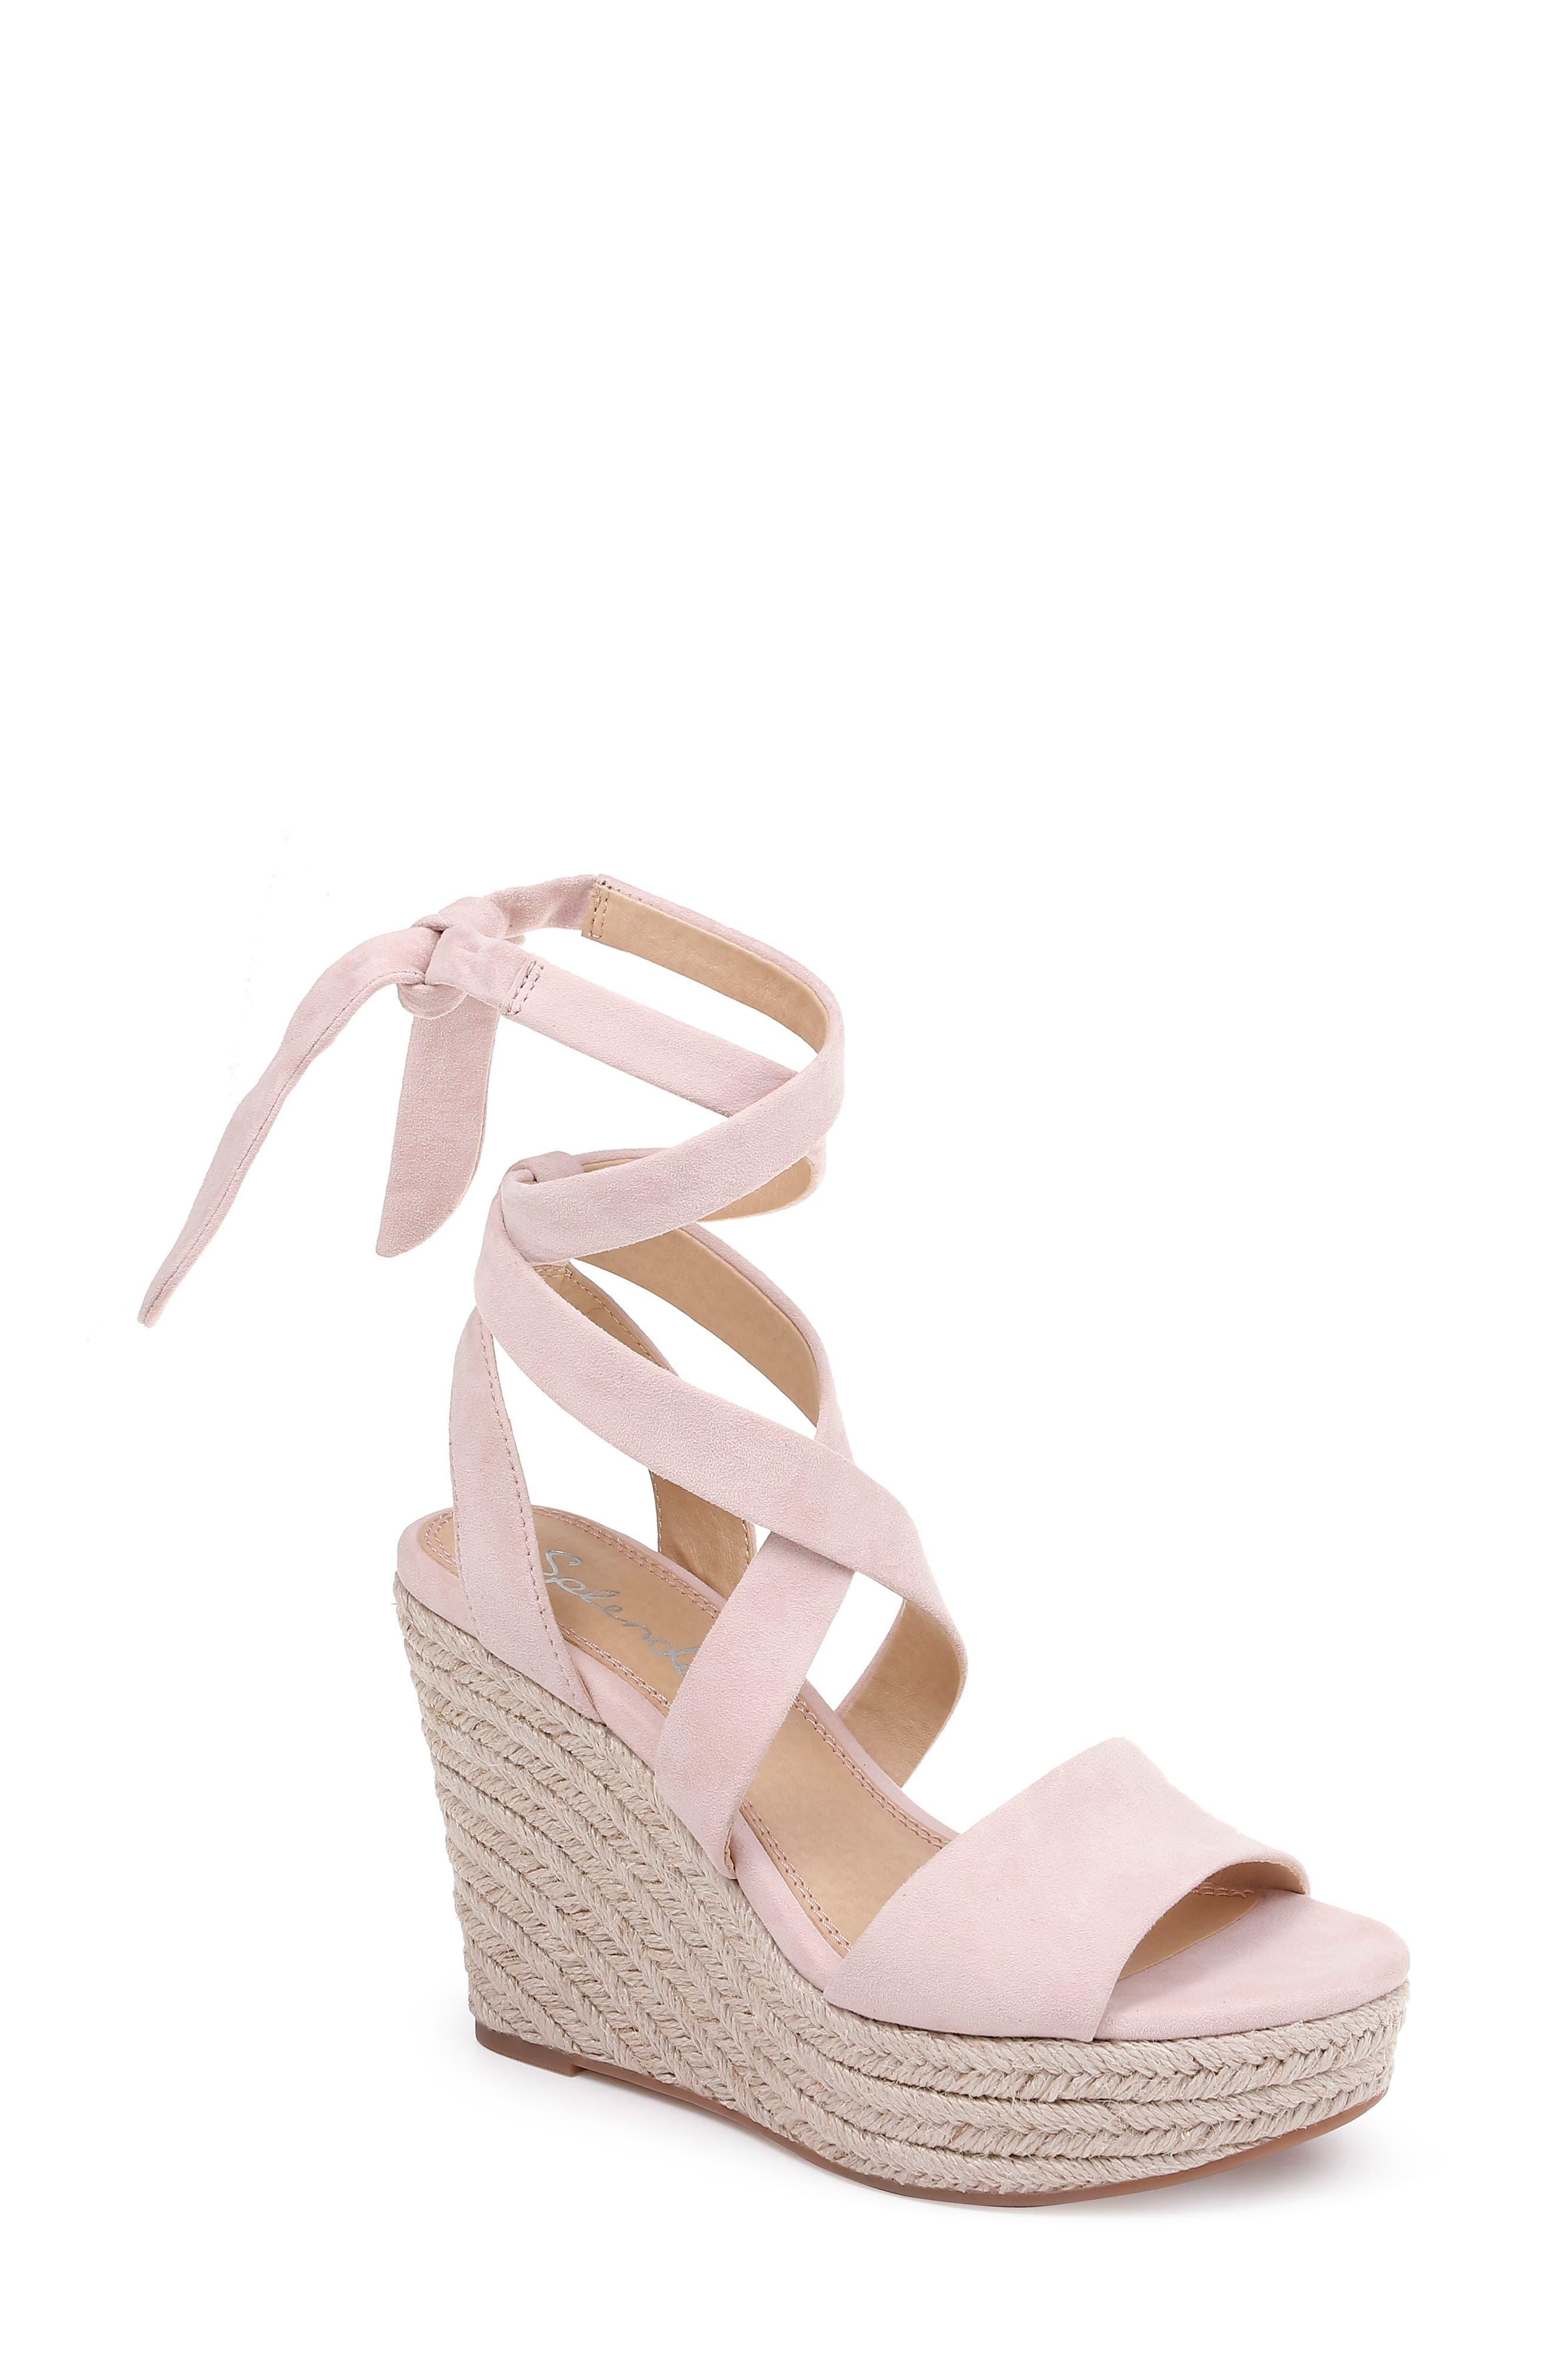 Splendid Tessie Ankle Wrap Wedge Sandal- Pink